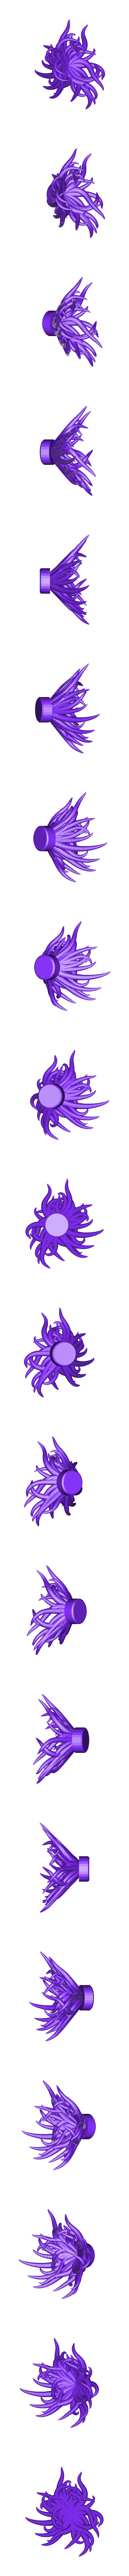 tentacle3.stl Download free STL file Plastic Reef #1: Random Anemone Generator • Object to 3D print, ferjerez3d